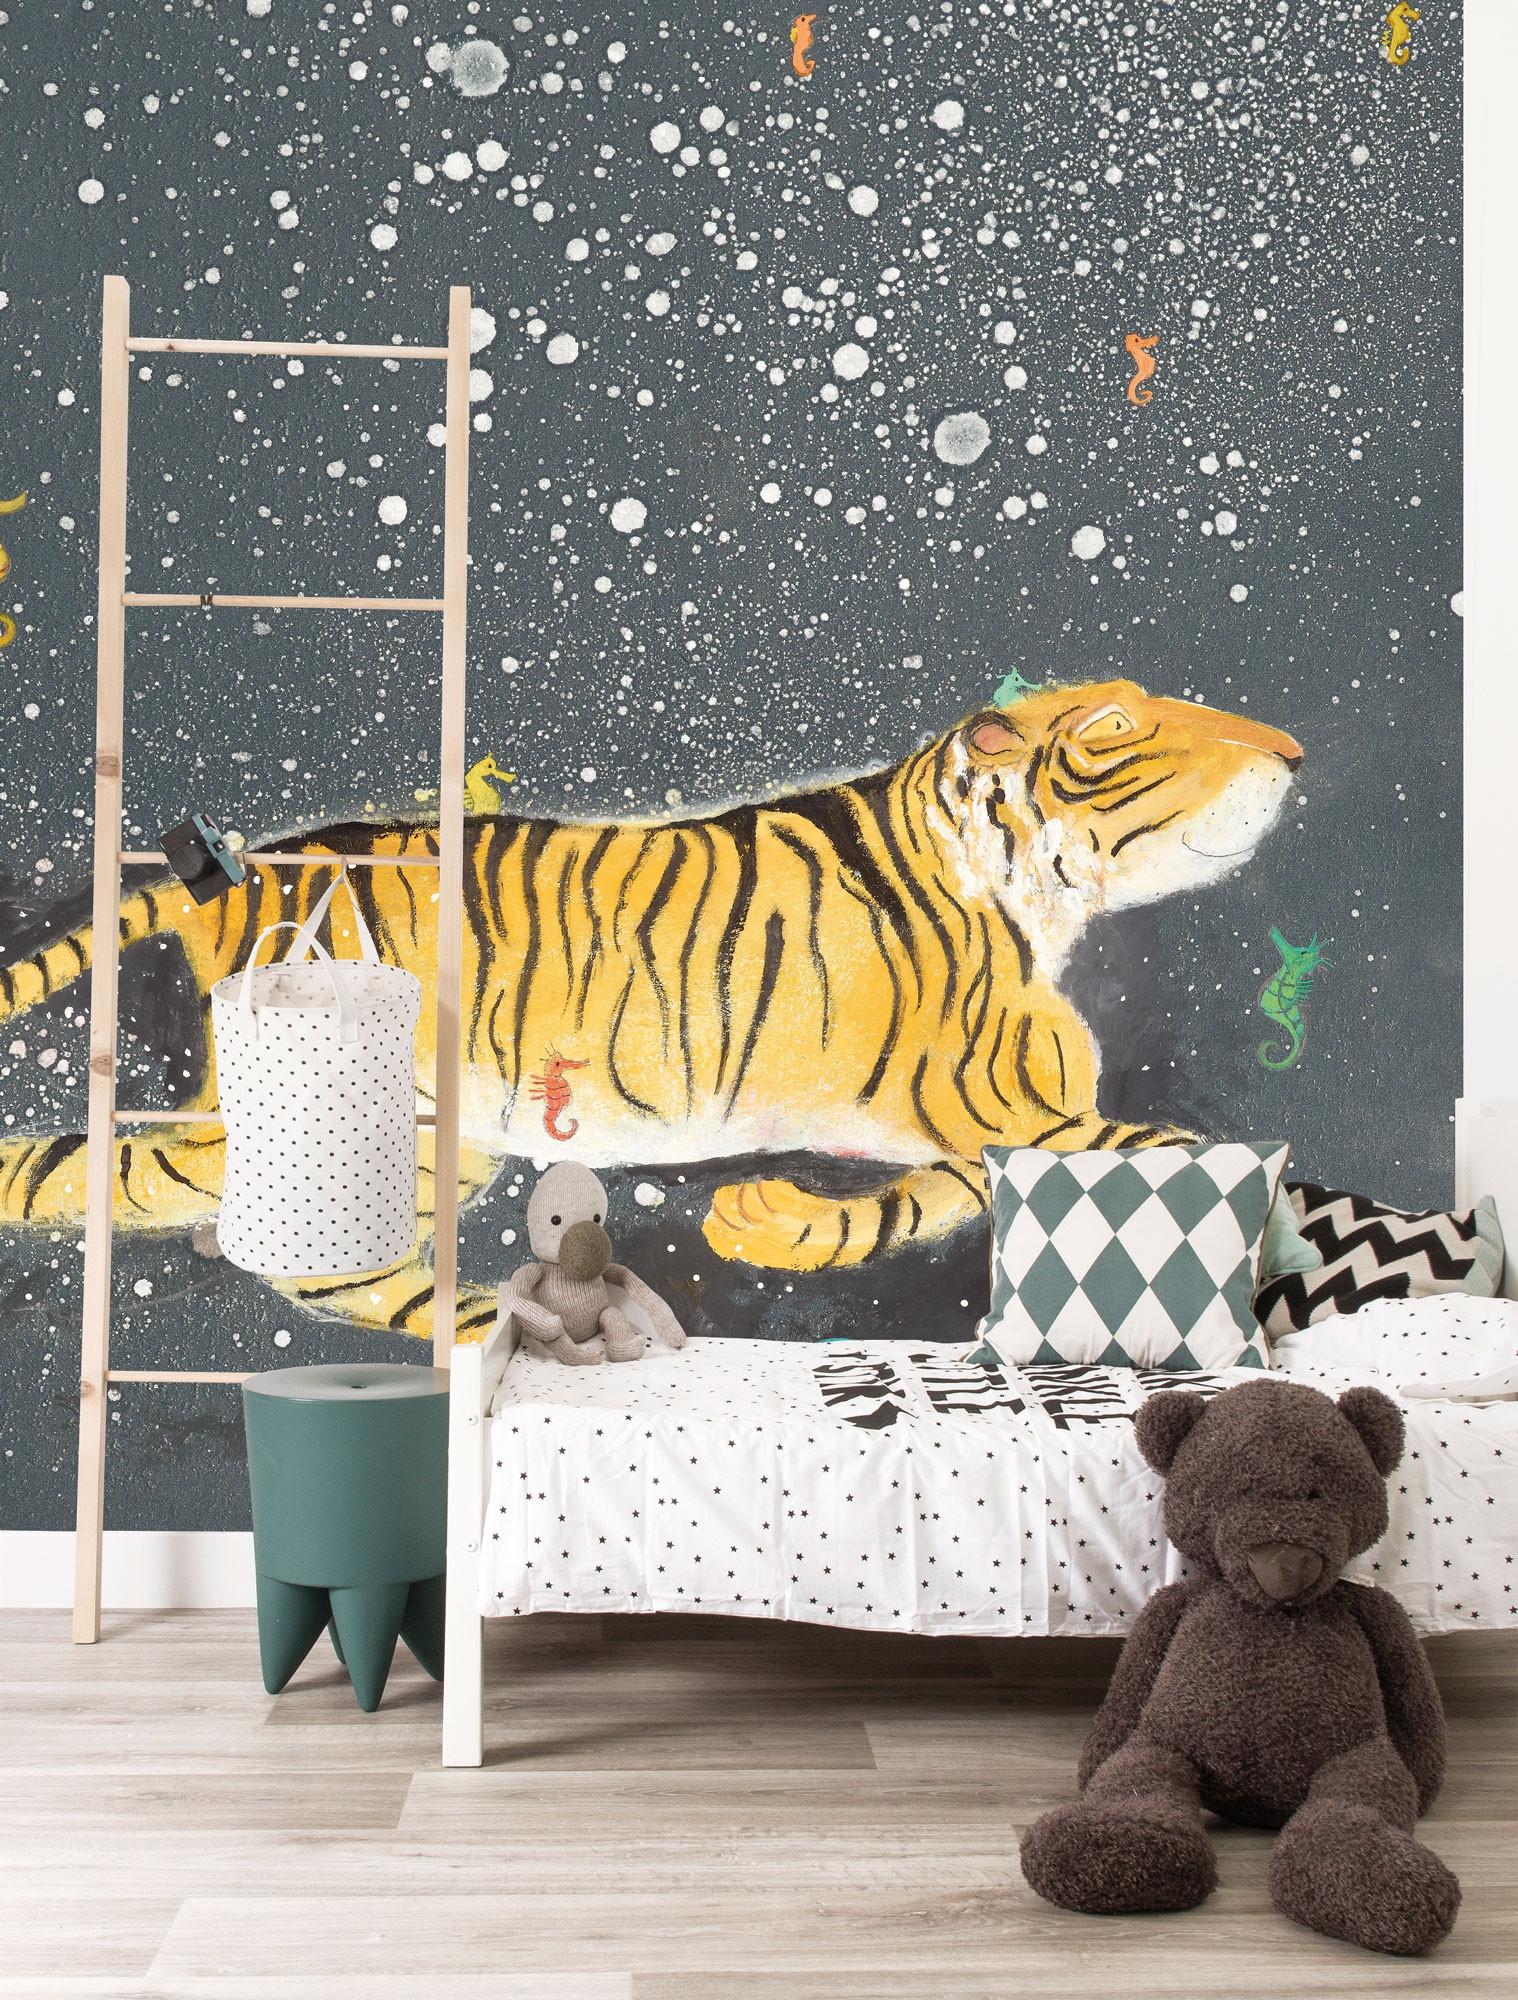 KEK Fotobehang Smiling Tiger, 389.6 x 280 cm-08718754015899-311